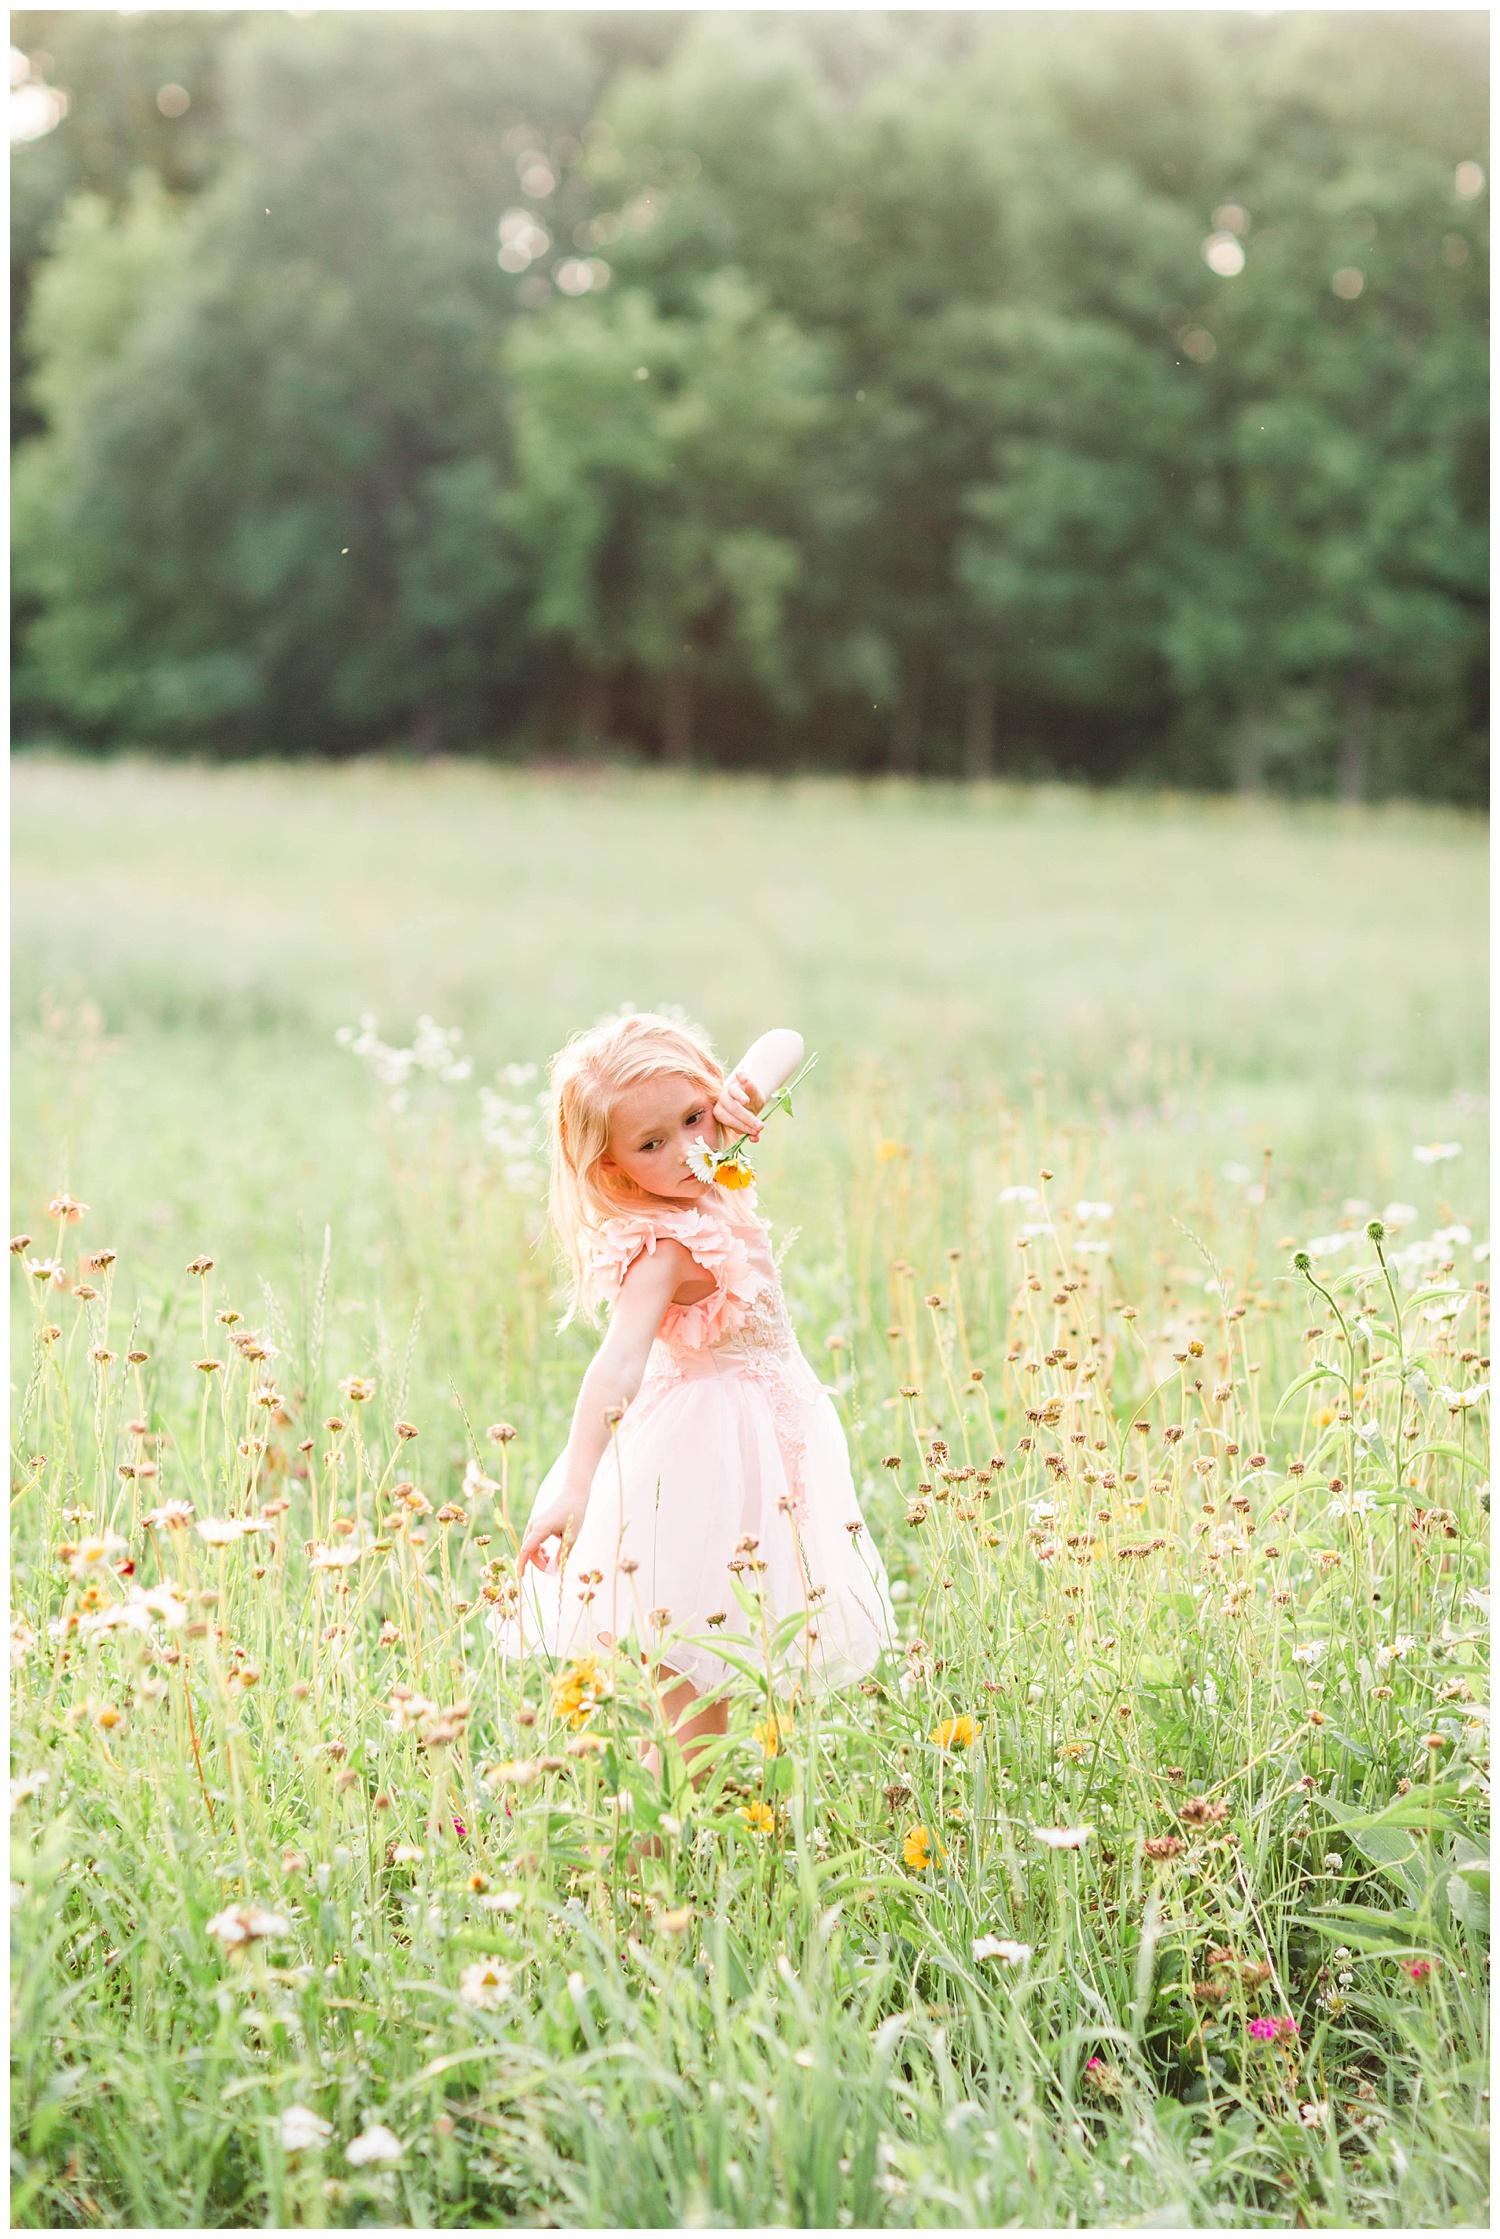 Little Liella dances in a field of wild flowers holding a bouquet wearing tutu du monde couture dress by Trish Scully | CB Studio